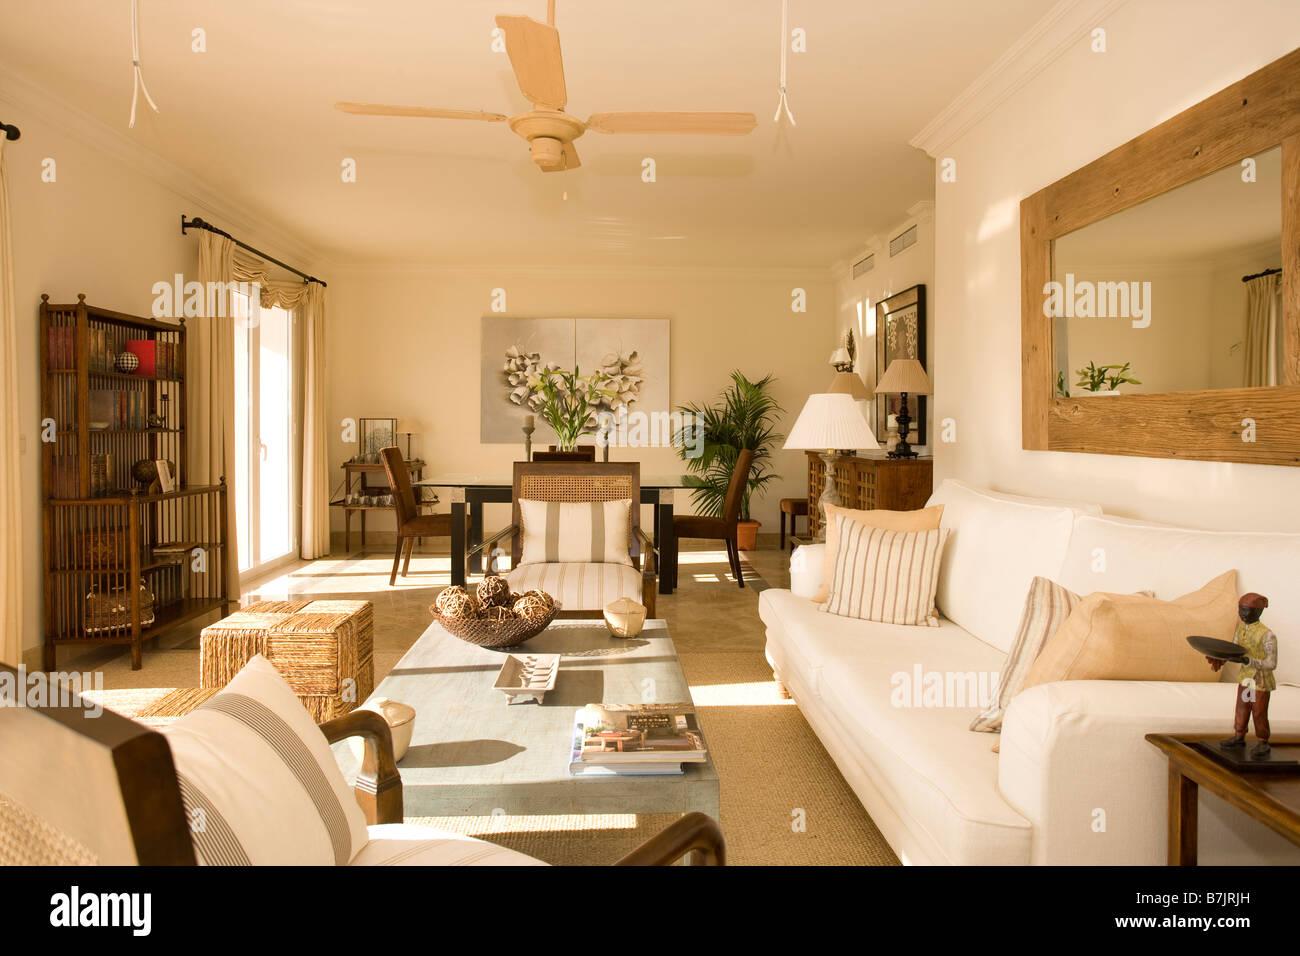 grand miroir en bois au dessus du canap cr me dans openplan moderne salon et salle manger. Black Bedroom Furniture Sets. Home Design Ideas